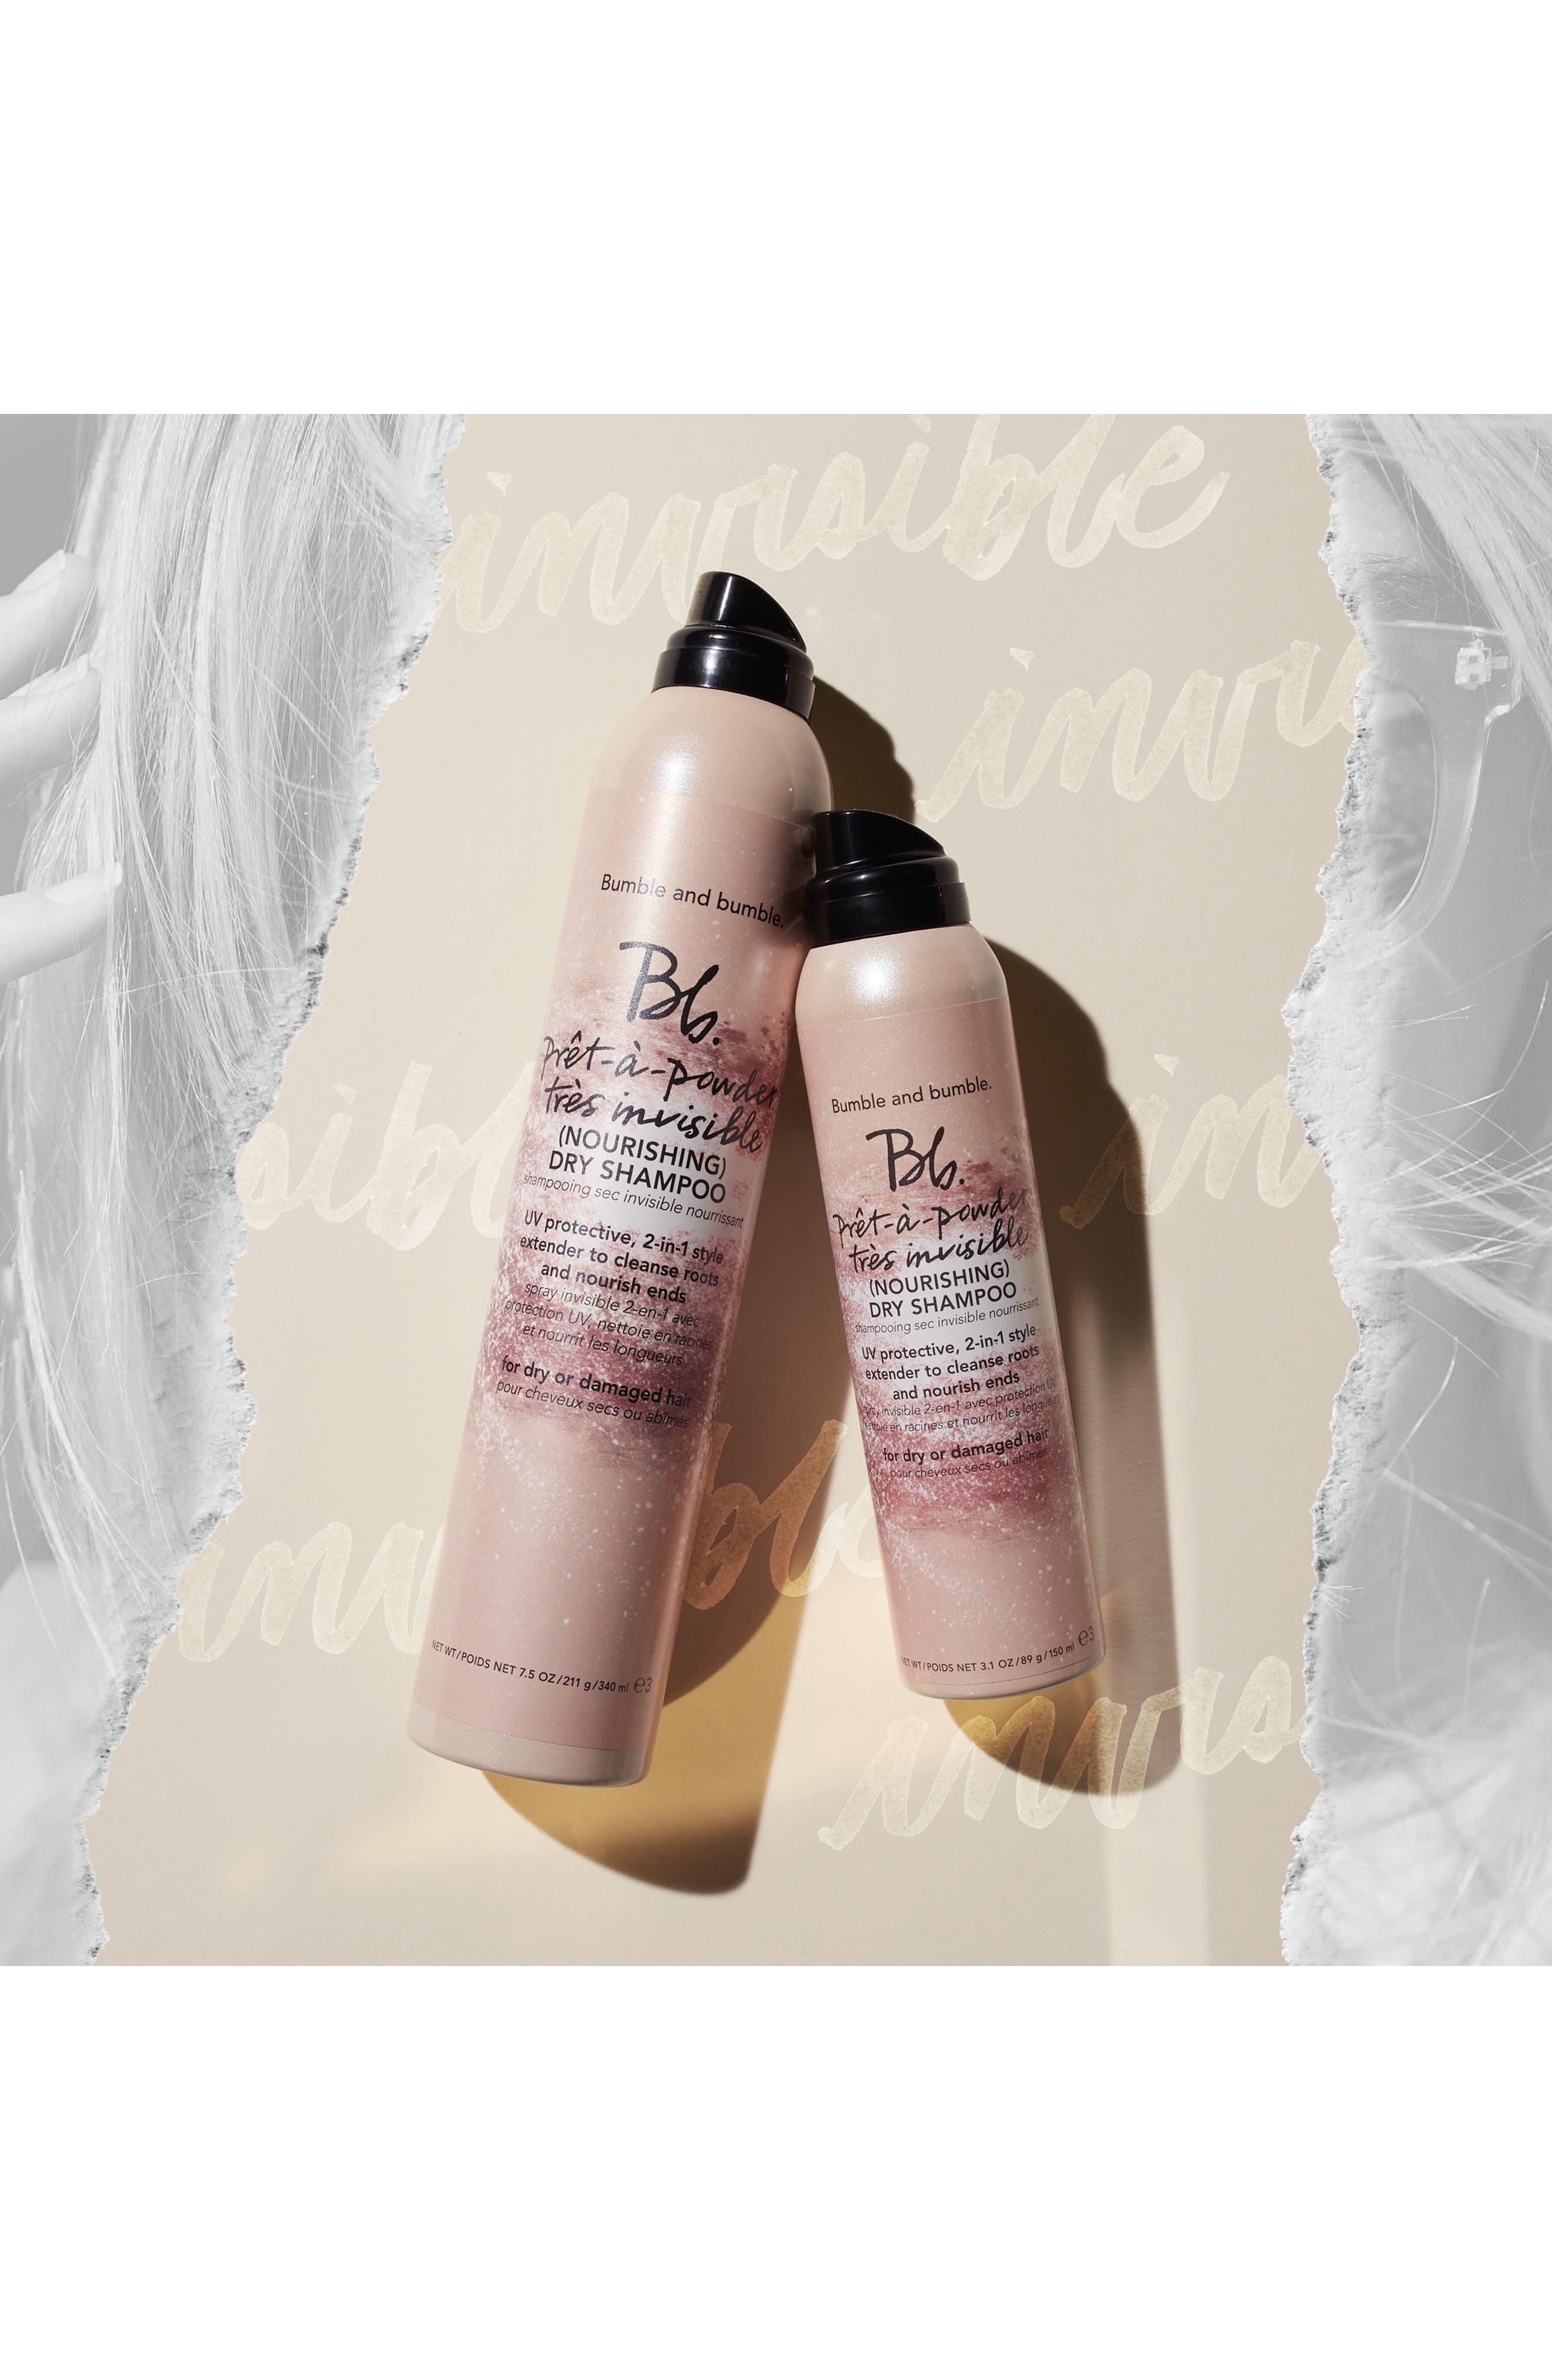 BUMBLE AND BUMBLE,                             Prêt-a-Powder Très Invisible Nourishing Dry Shampoo,                             Alternate thumbnail 6, color,                             NO COLOR